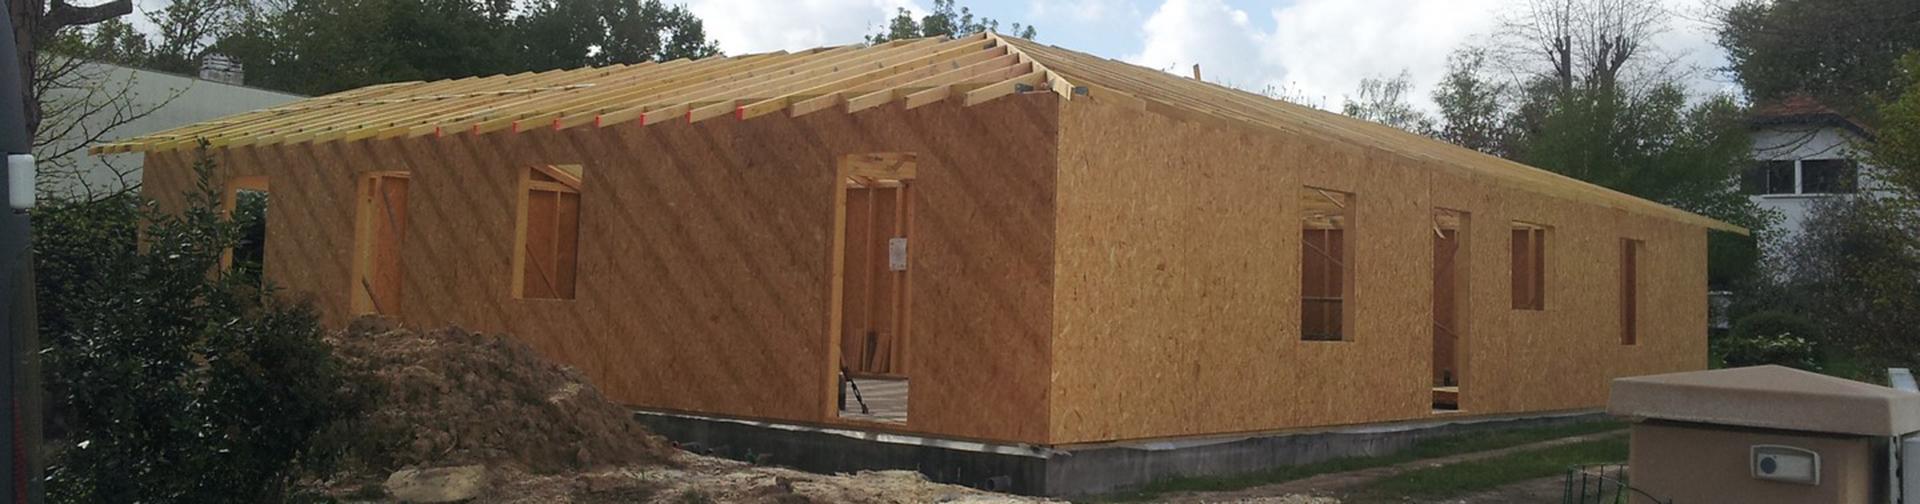 Maison ossature bois gironde agrandissement sur l vation for Agrandissement maison ossature bois